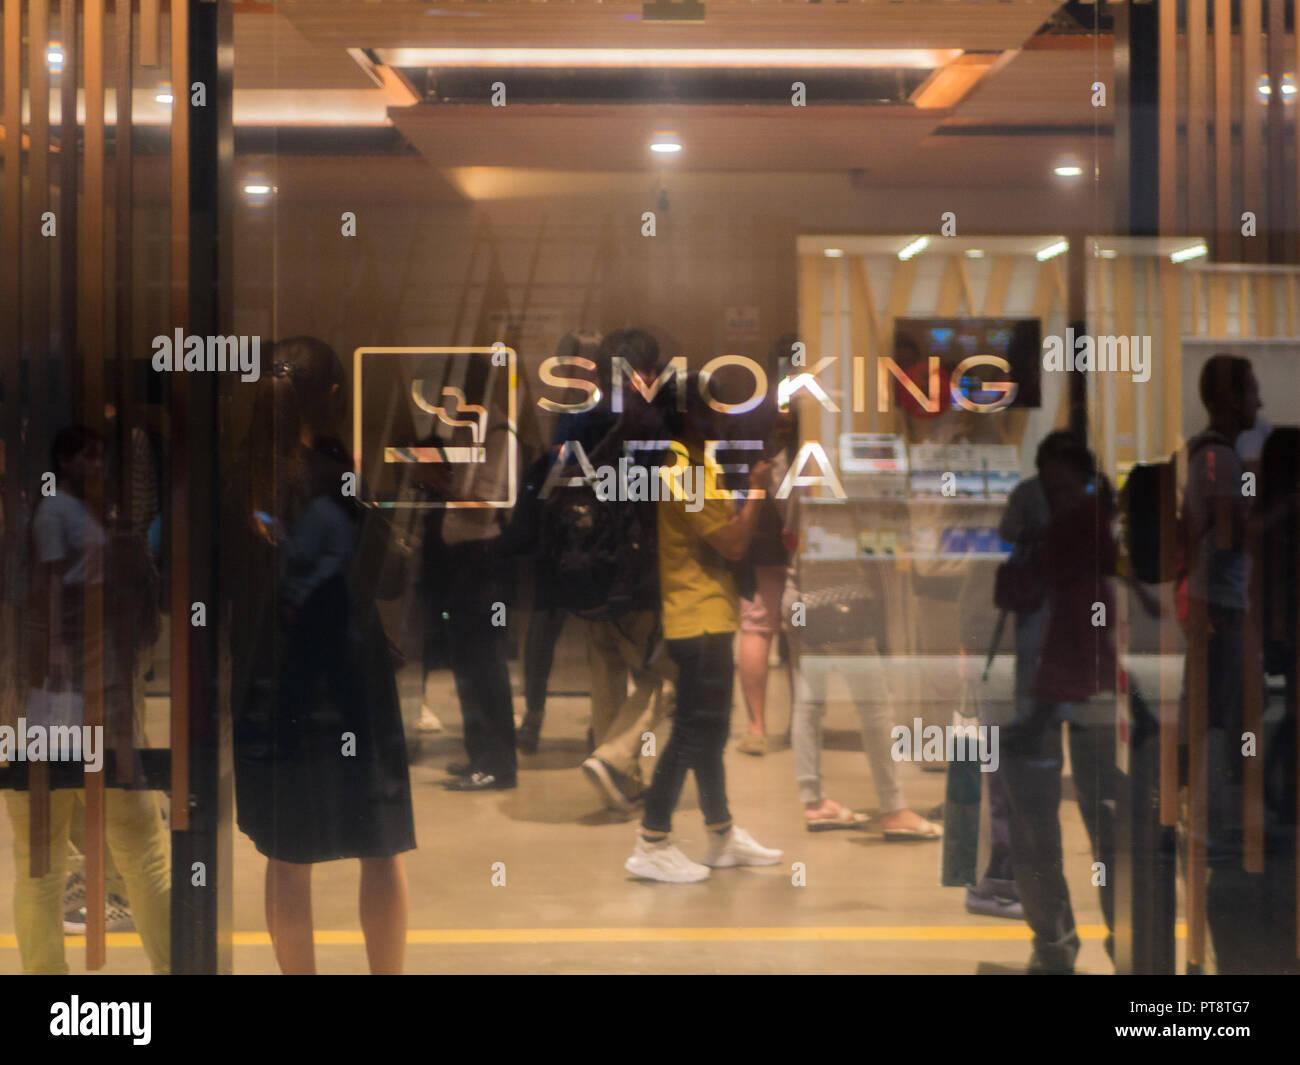 A modern smoking area near Shinjuku station in Tokyo, Japan. Stock Photo